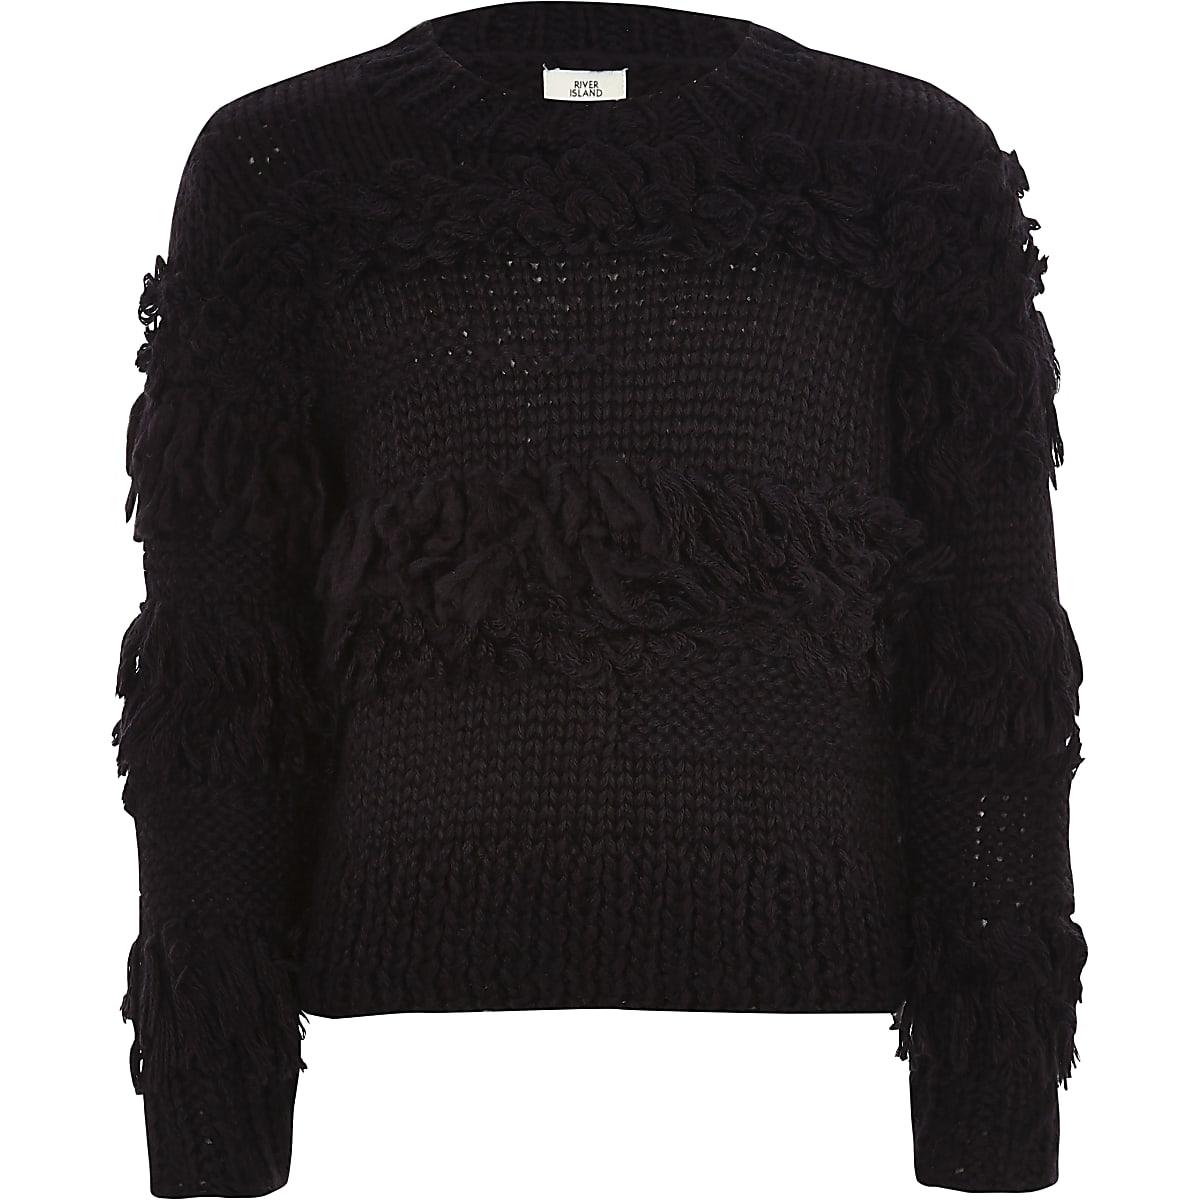 Girls black fringe trim hand knitted jumper